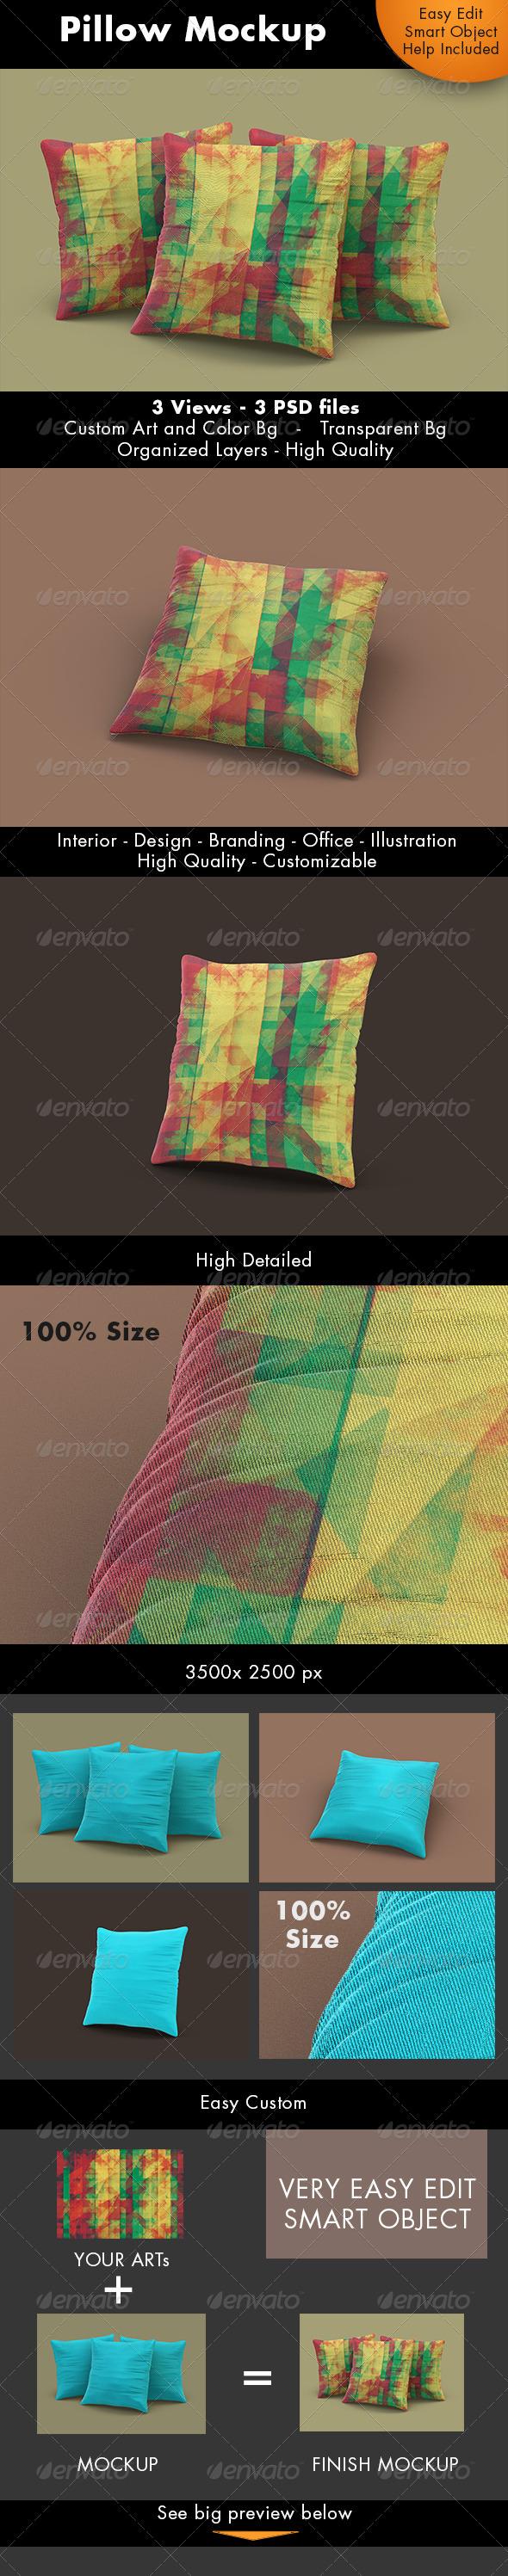 Pillow Mockup - Miscellaneous Product Mock-Ups